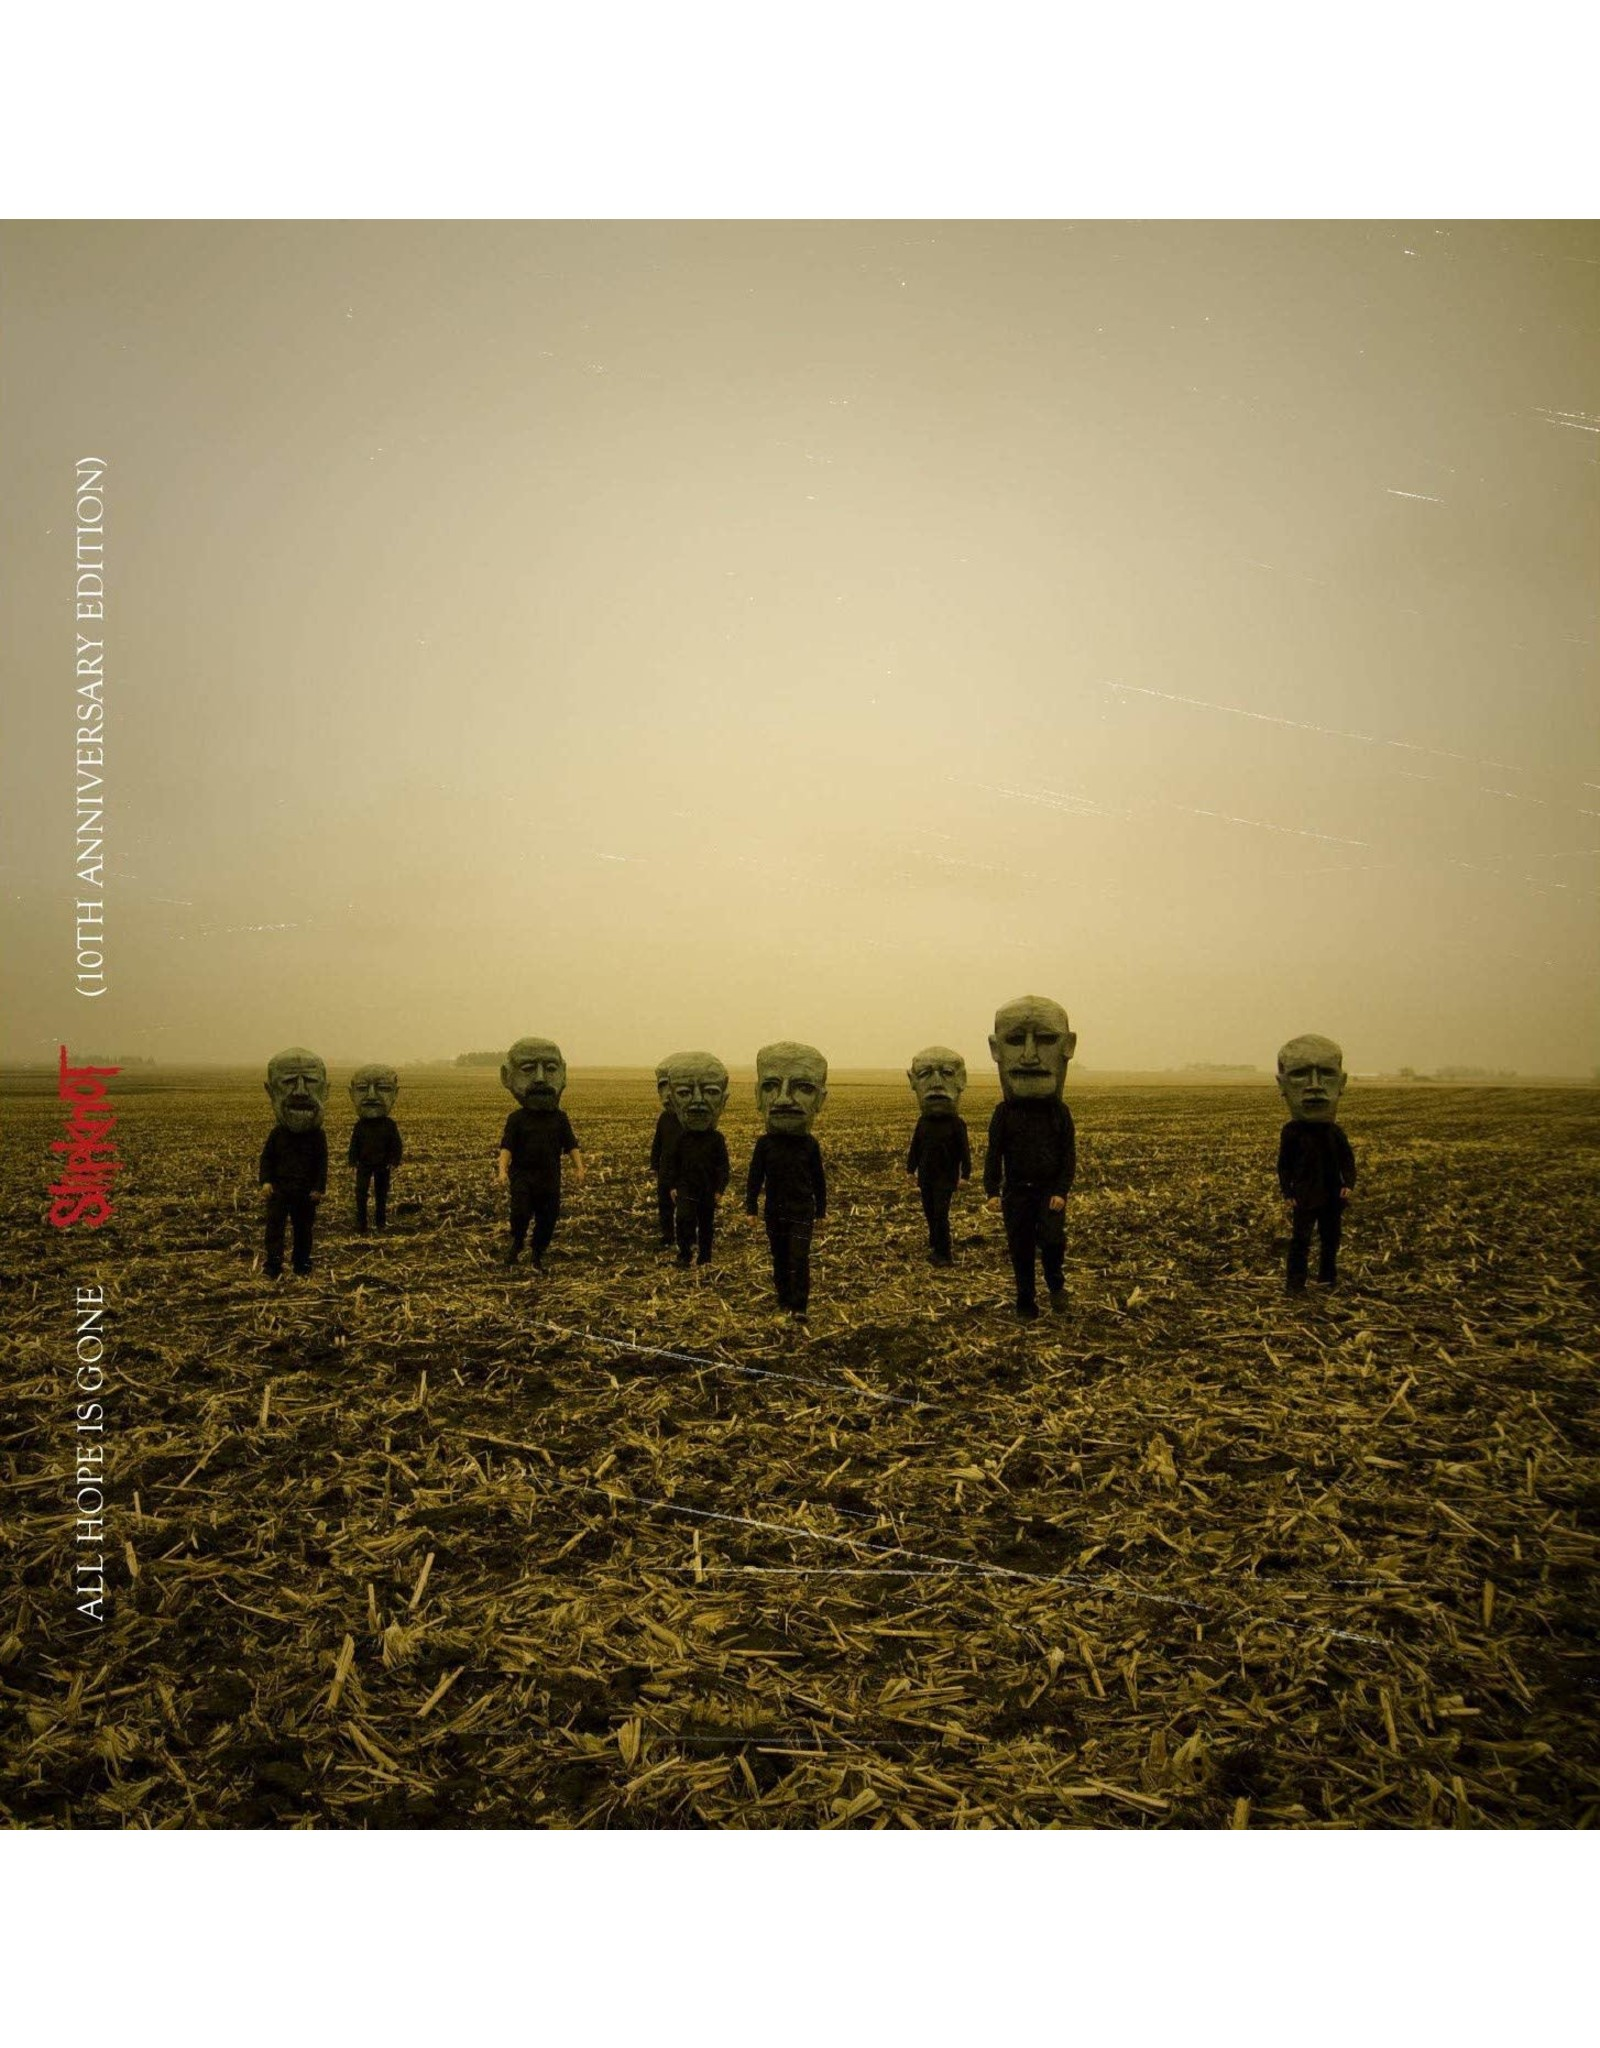 Slipknot - All Hope Is Gone (10th Anniversary)